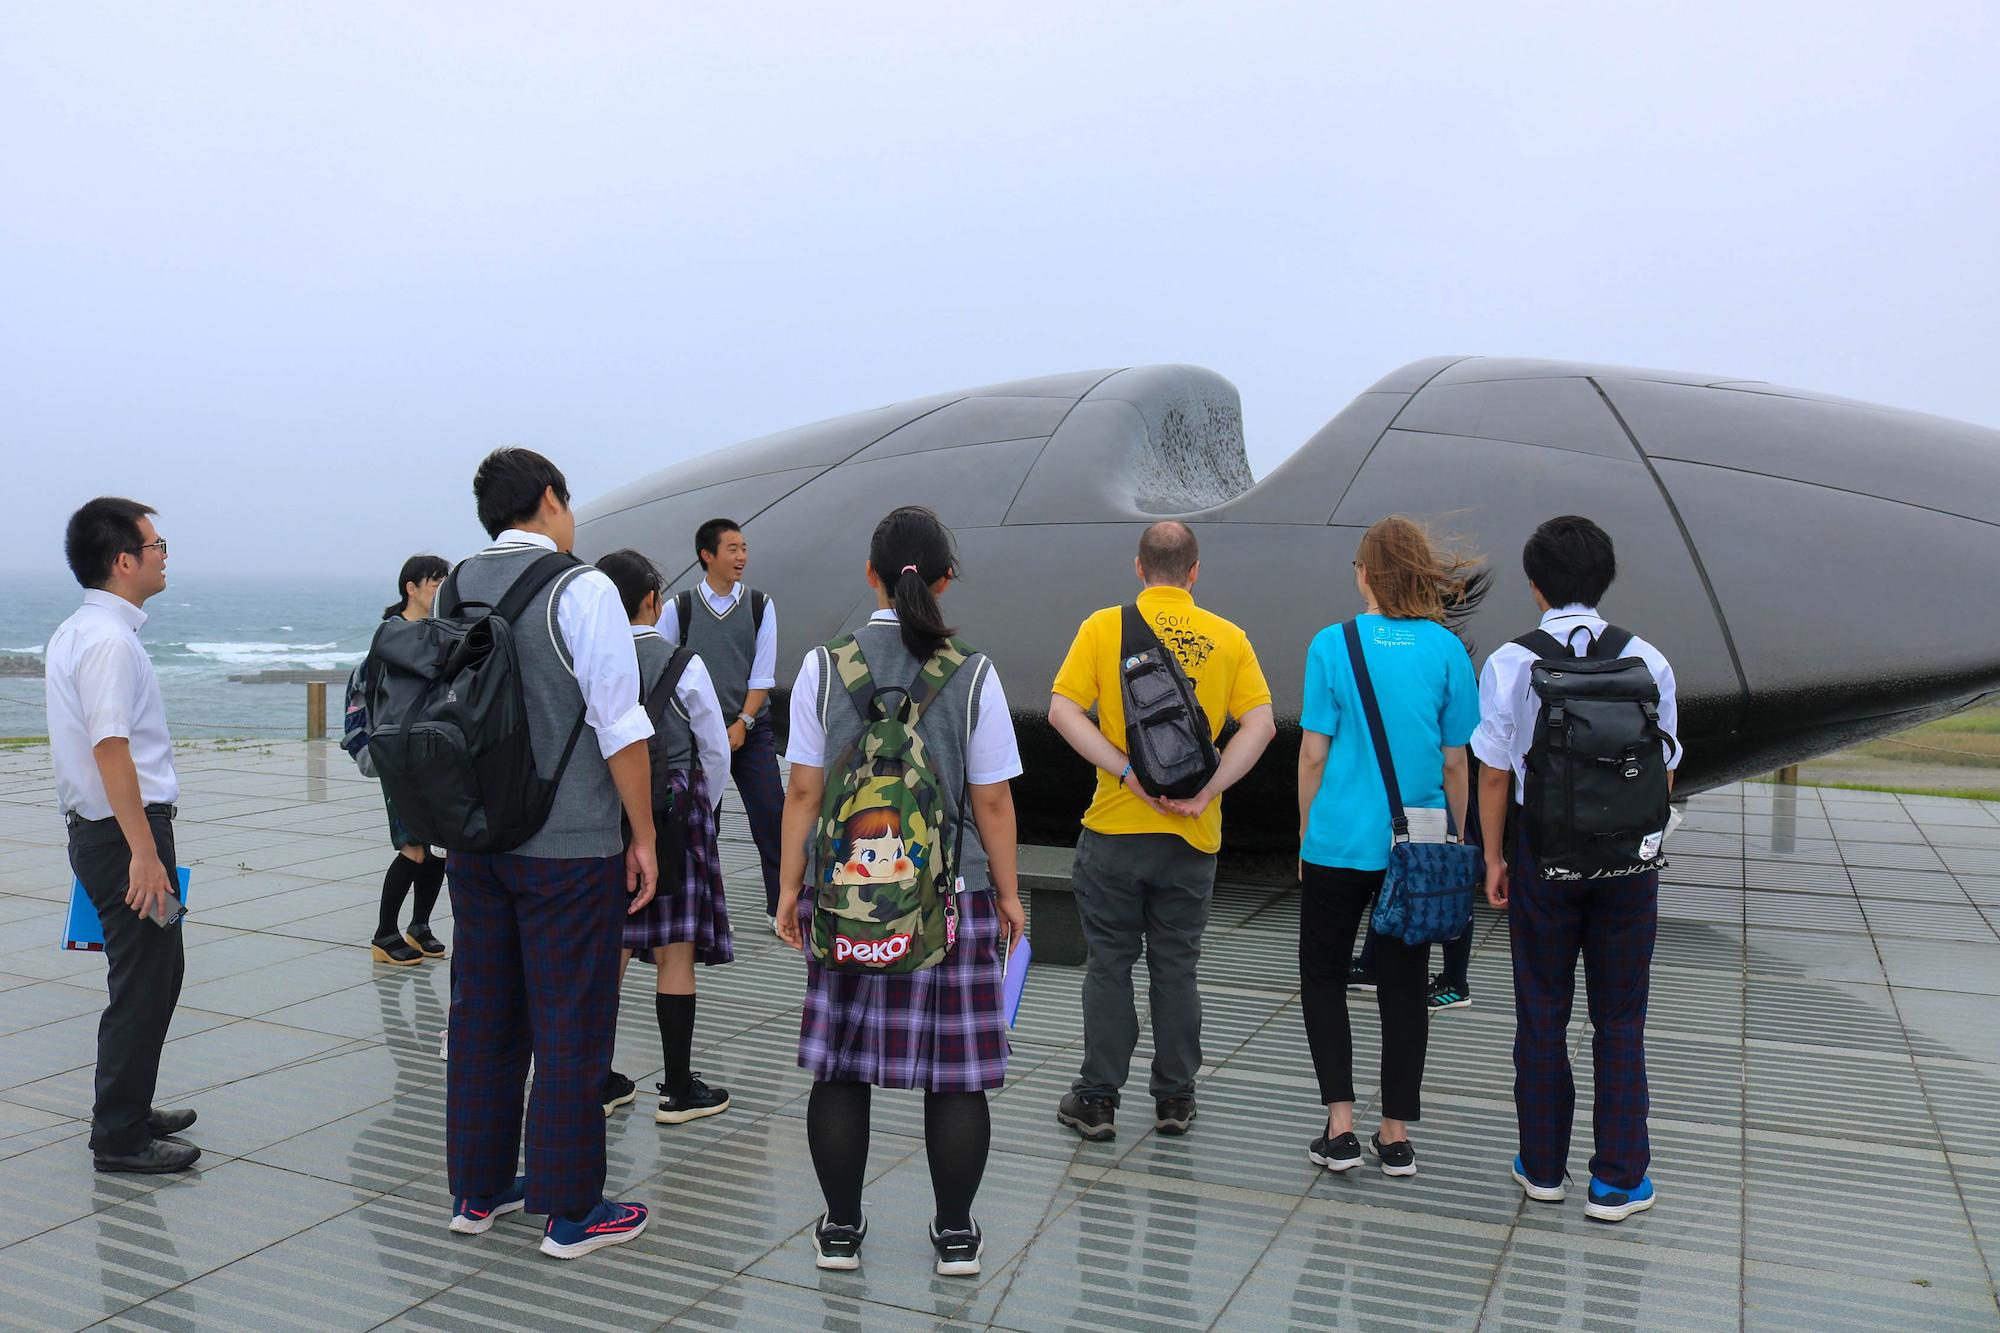 ALTと共にプレガイドツアーを行う奥尻高校生